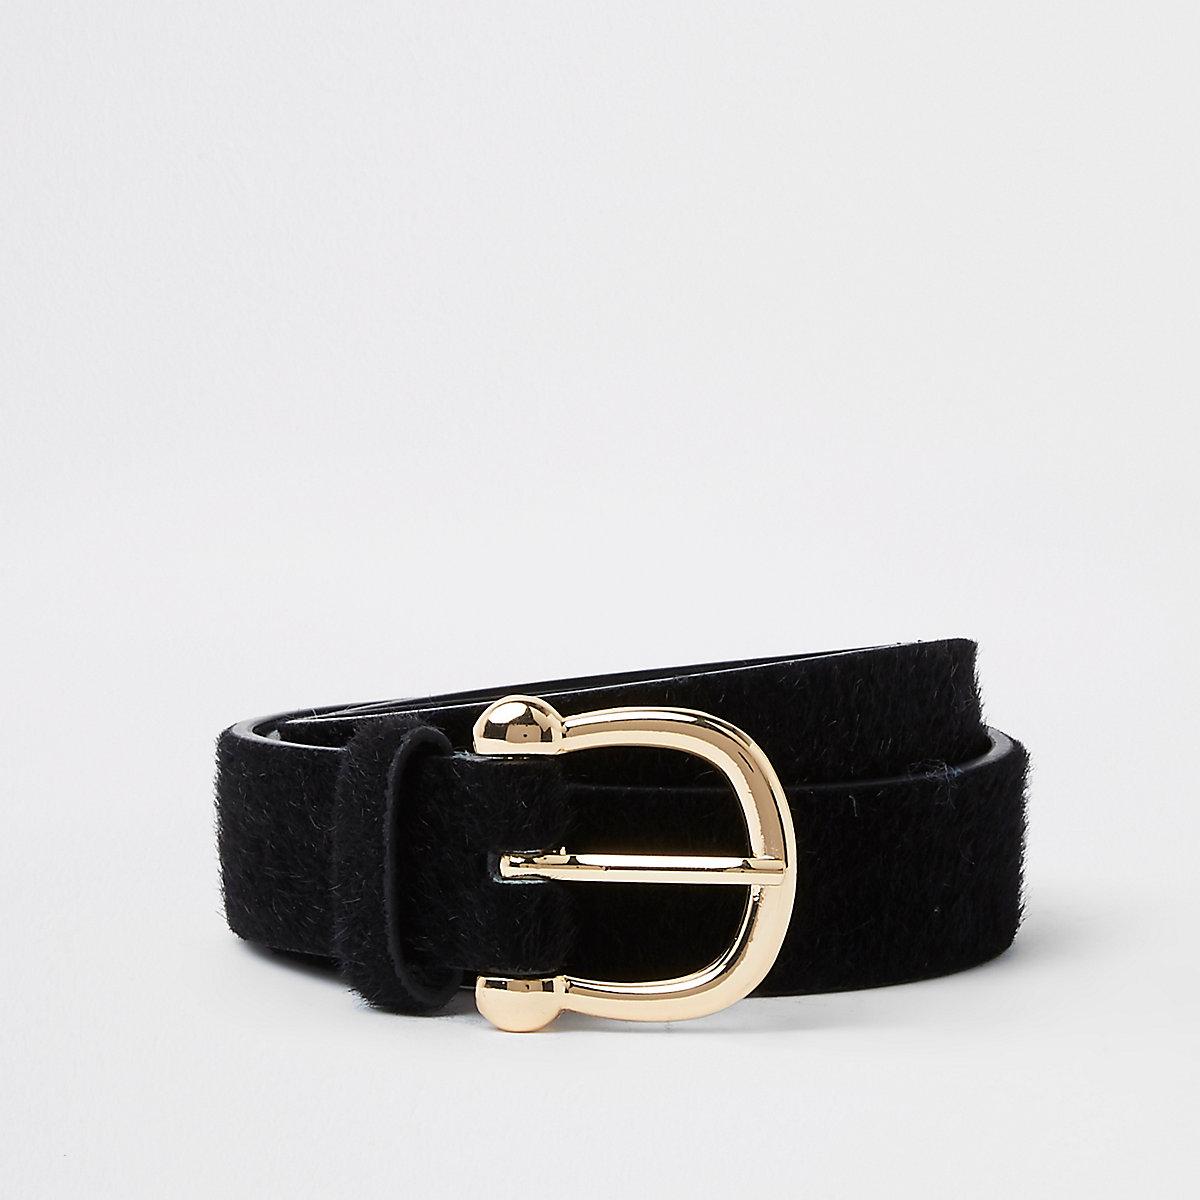 Black leather pony buckle belt